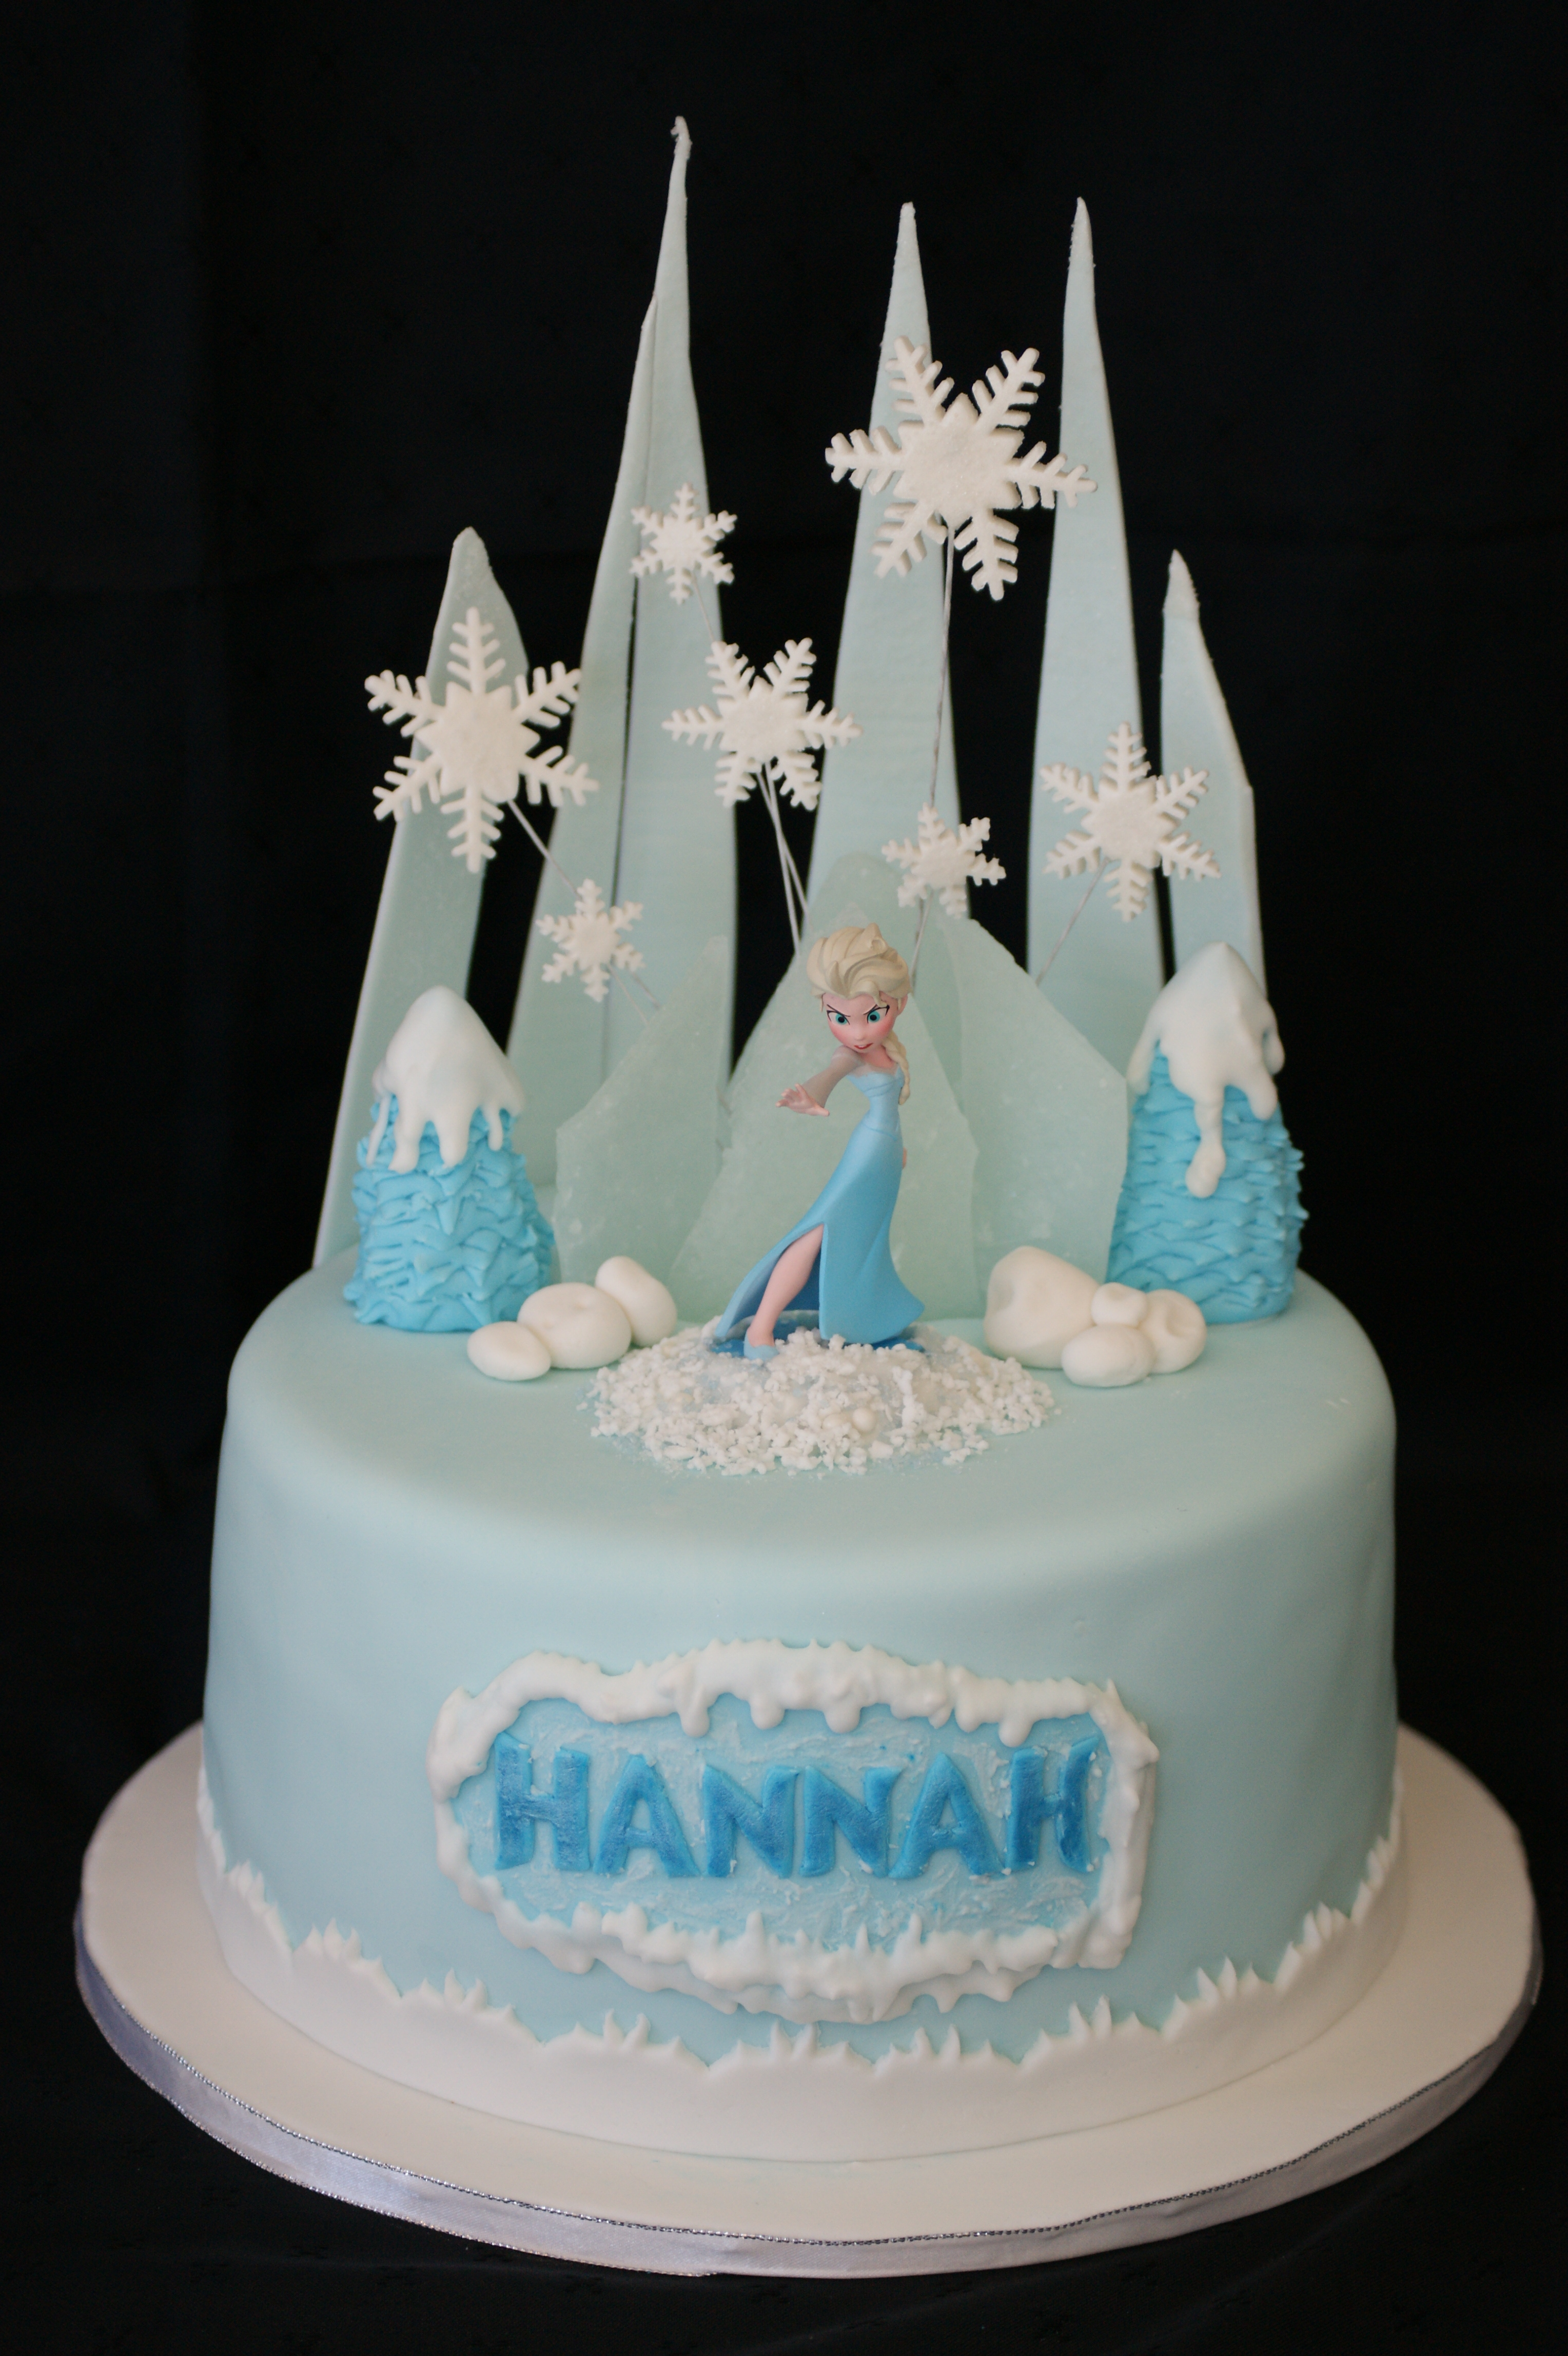 Pleasing 10 Frozen Birthday Cakes Pinterest Photo Elsa Frozen Cake Funny Birthday Cards Online Fluifree Goldxyz